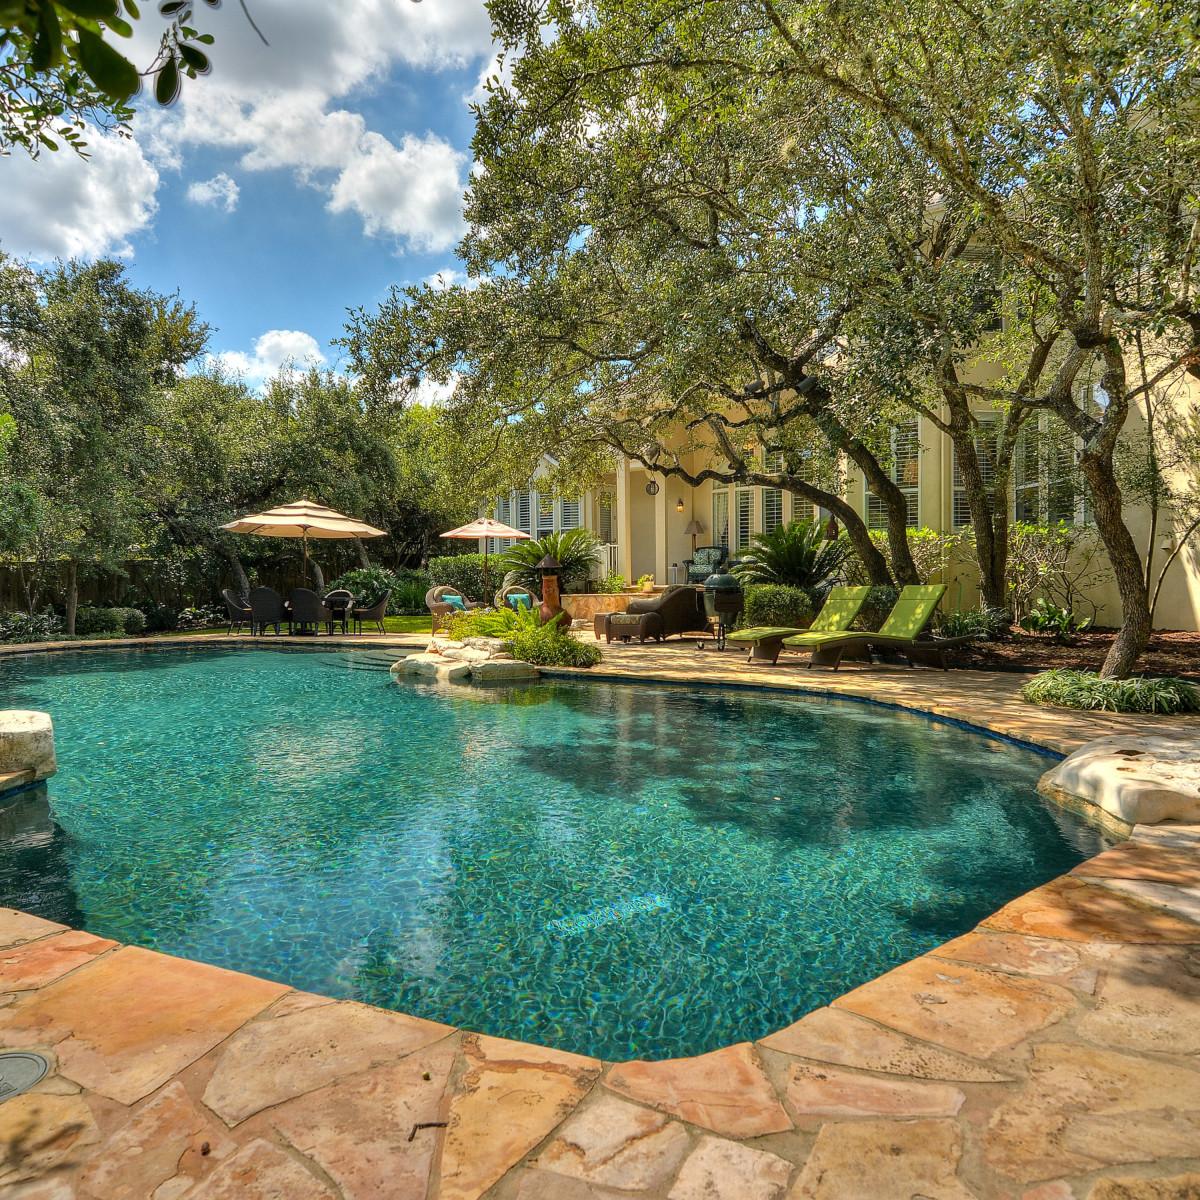 226 Post Oak Way San Antonio house for sale pool